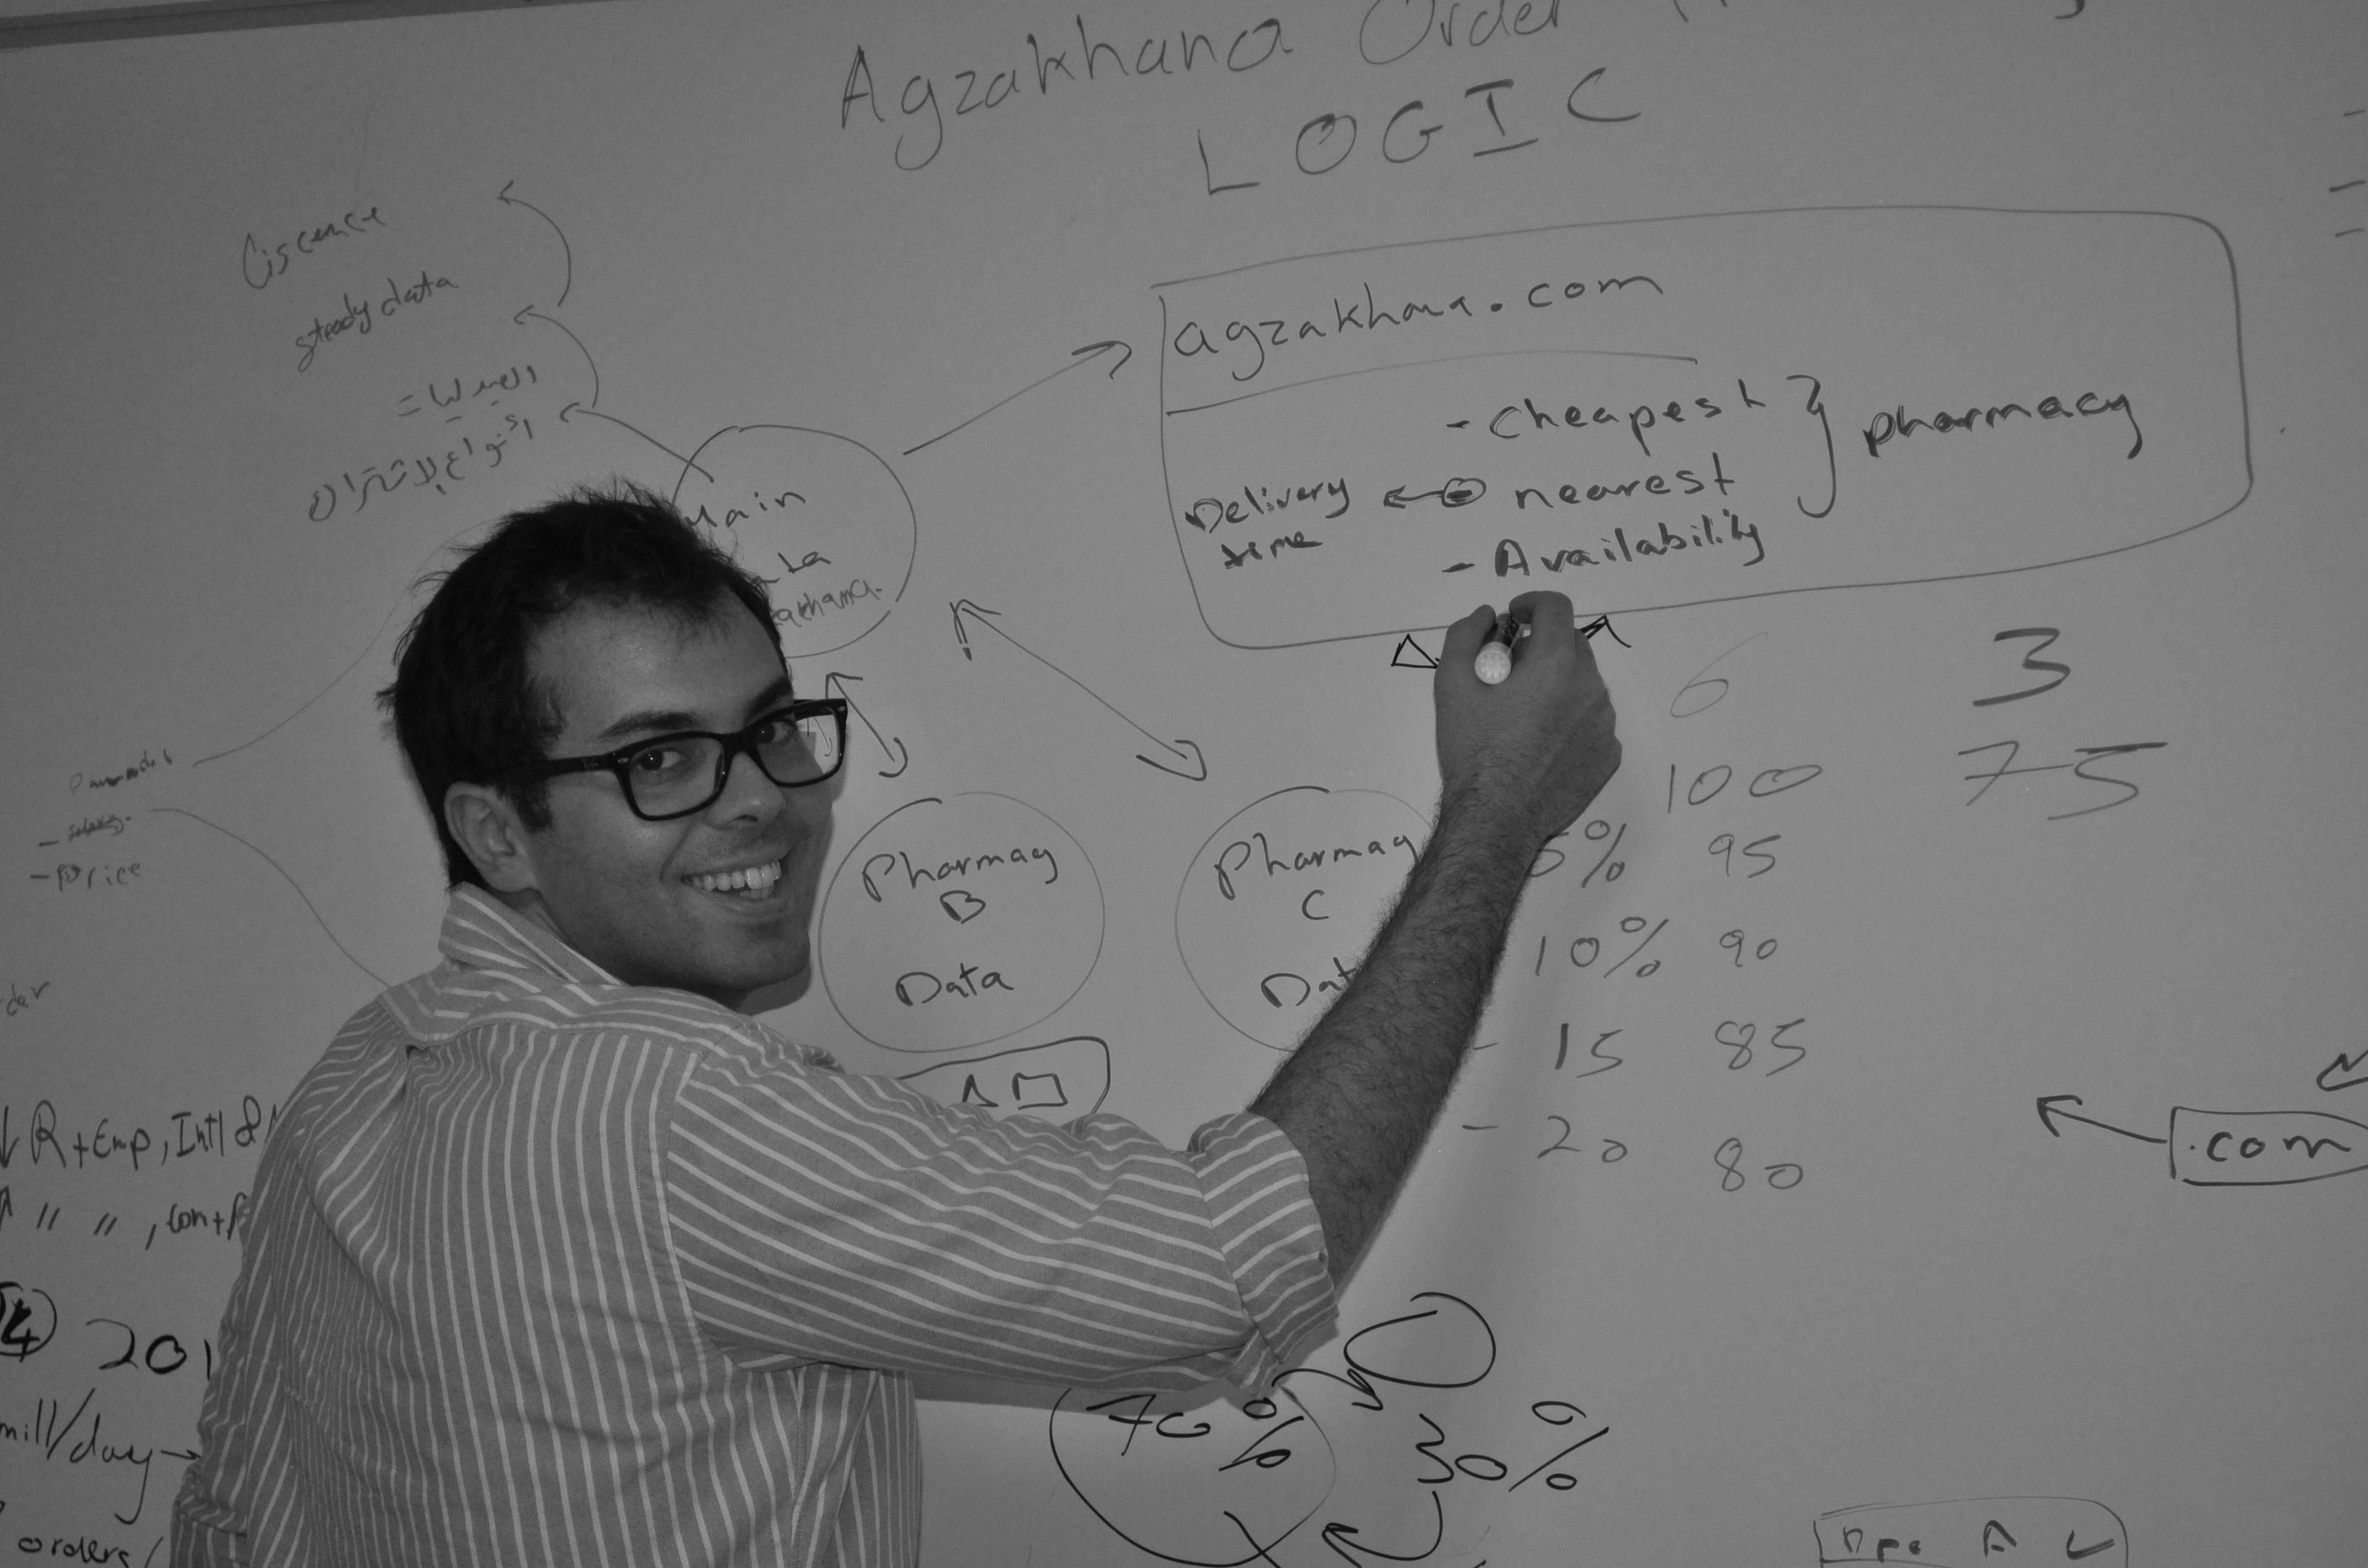 Ahmed Shabana, founder and director of Agzakhana.com (DNE Photo)